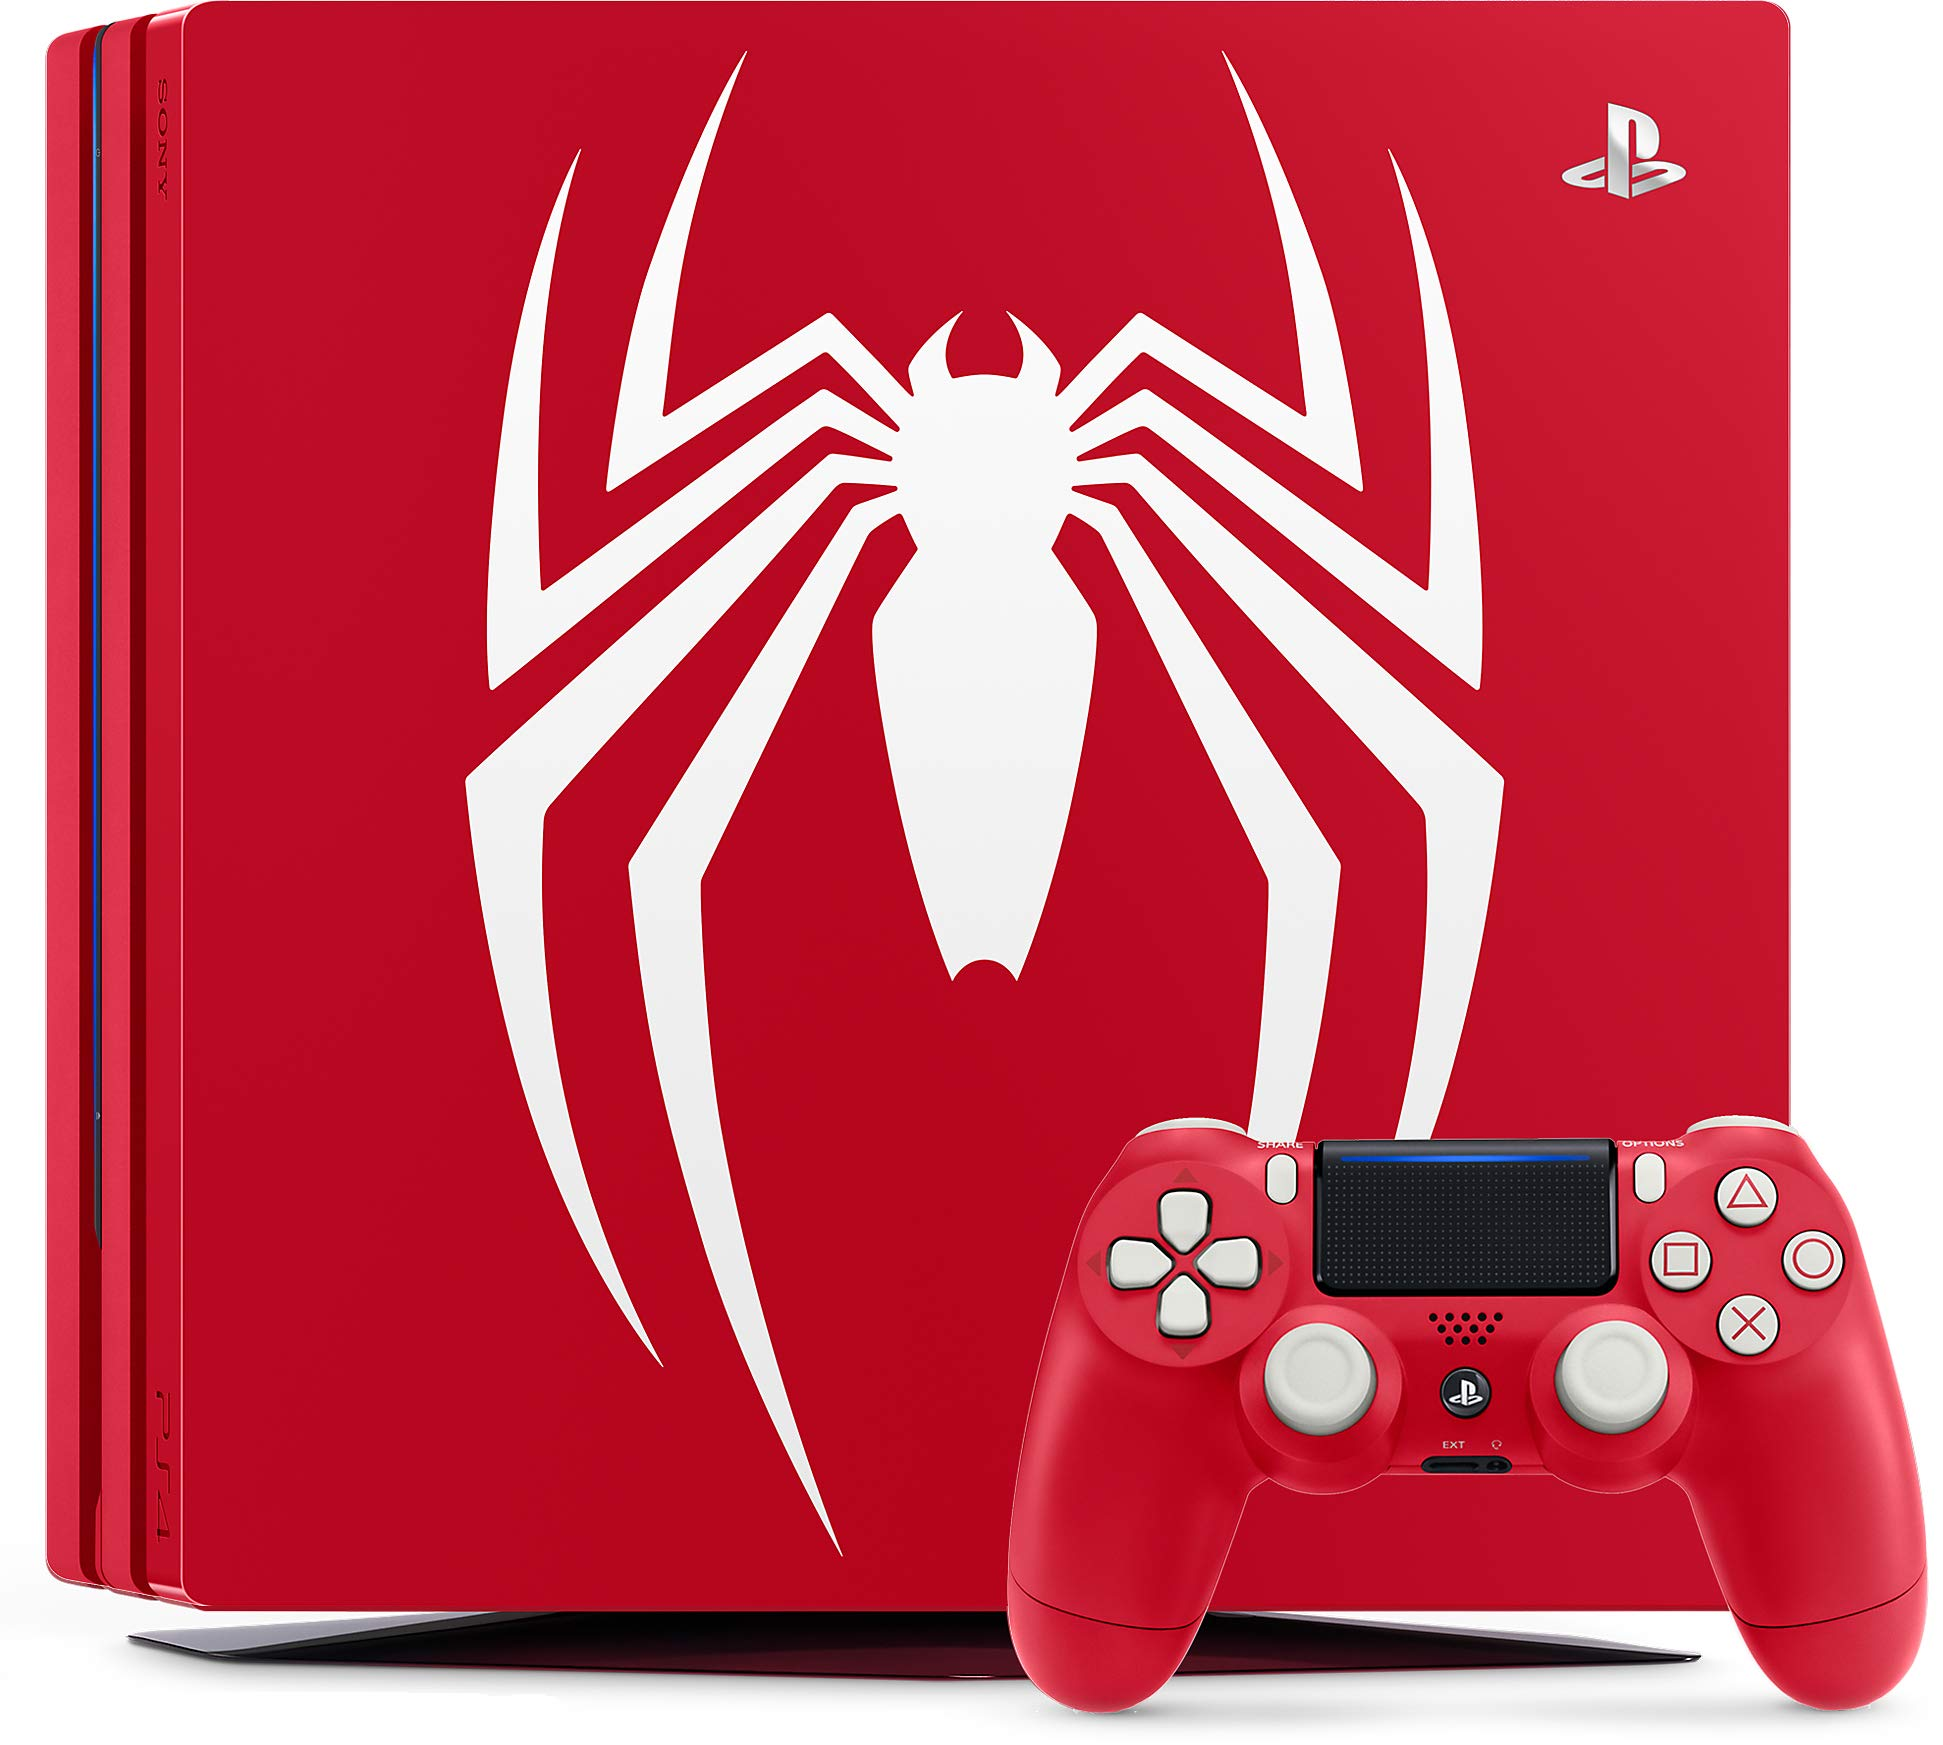 Sony Marvels Spider-Man - Limited Edition PS4 Pro Bundle Rojo 1000 GB Wifi - Videoconsolas (PlayStation 4 Pro, Rojo, 8192 MB, GDDR5, AMD Jaguar, AMD Radeon): Amazon.es: Videojuegos